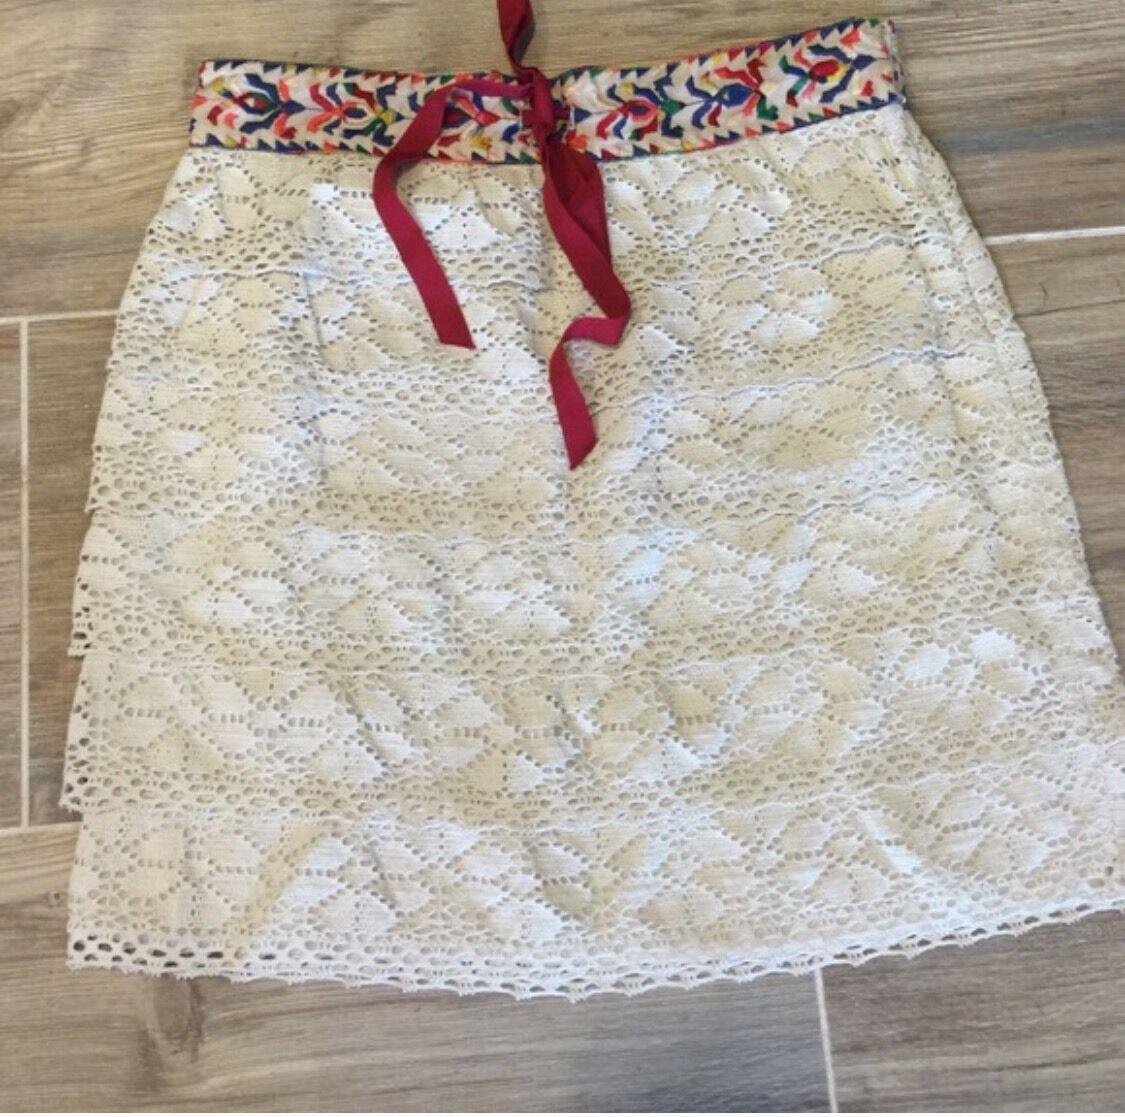 Anthropologie Anna Sui Embroidered Skirt Xs Euc Oaxaca